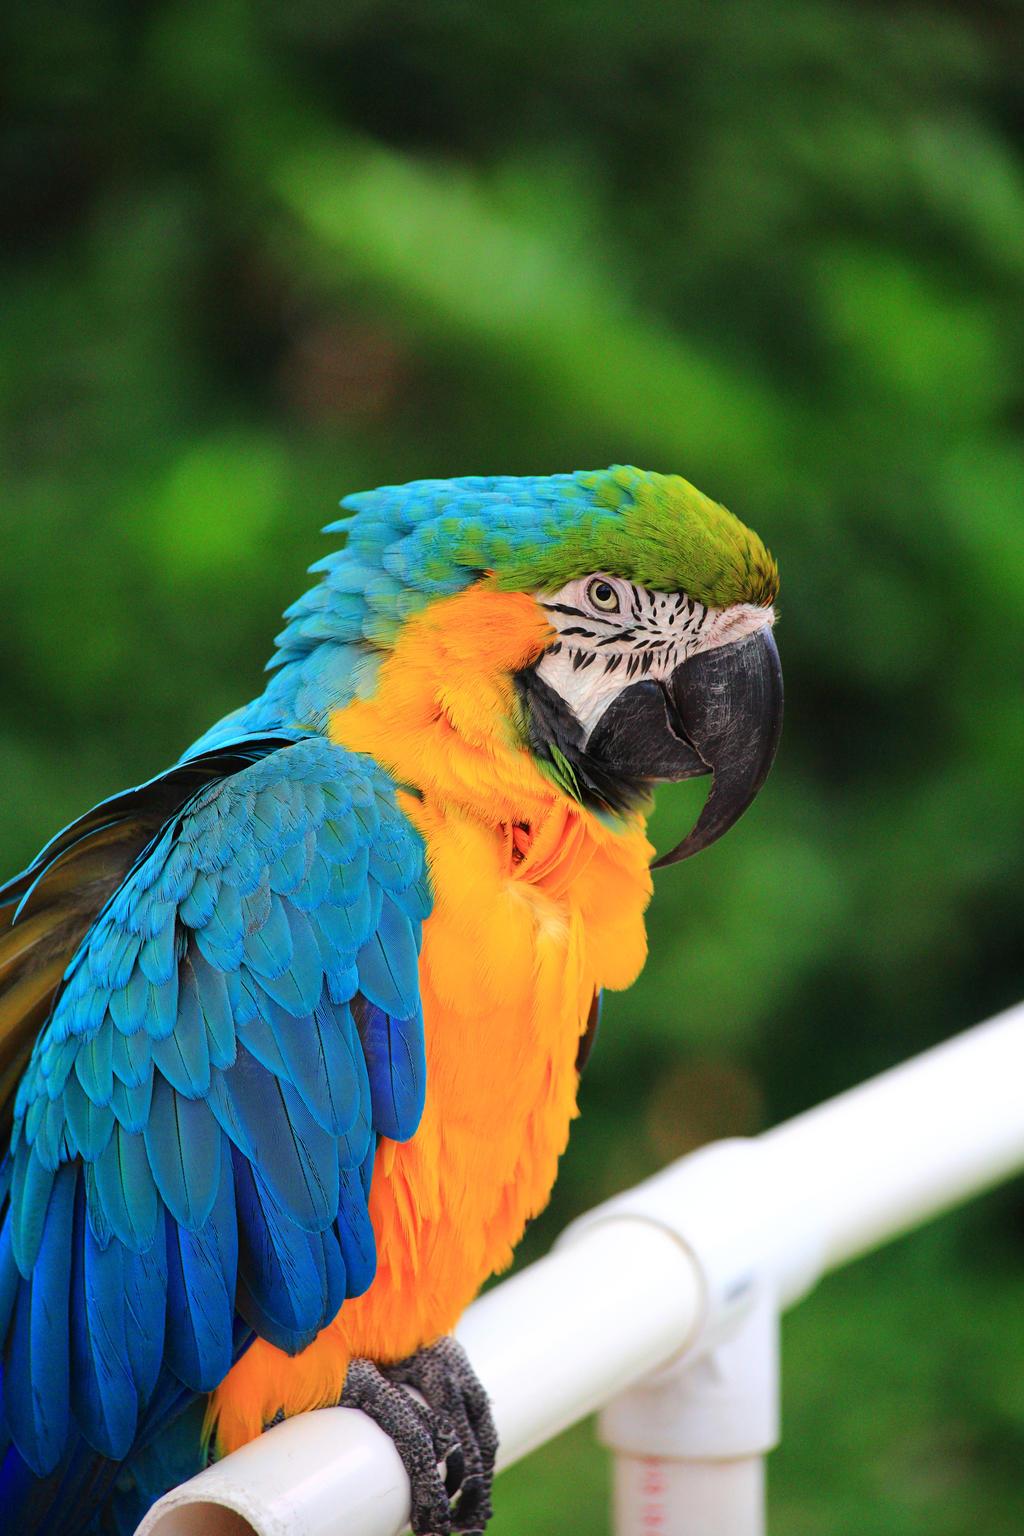 Stock: Bright Bird by Celem